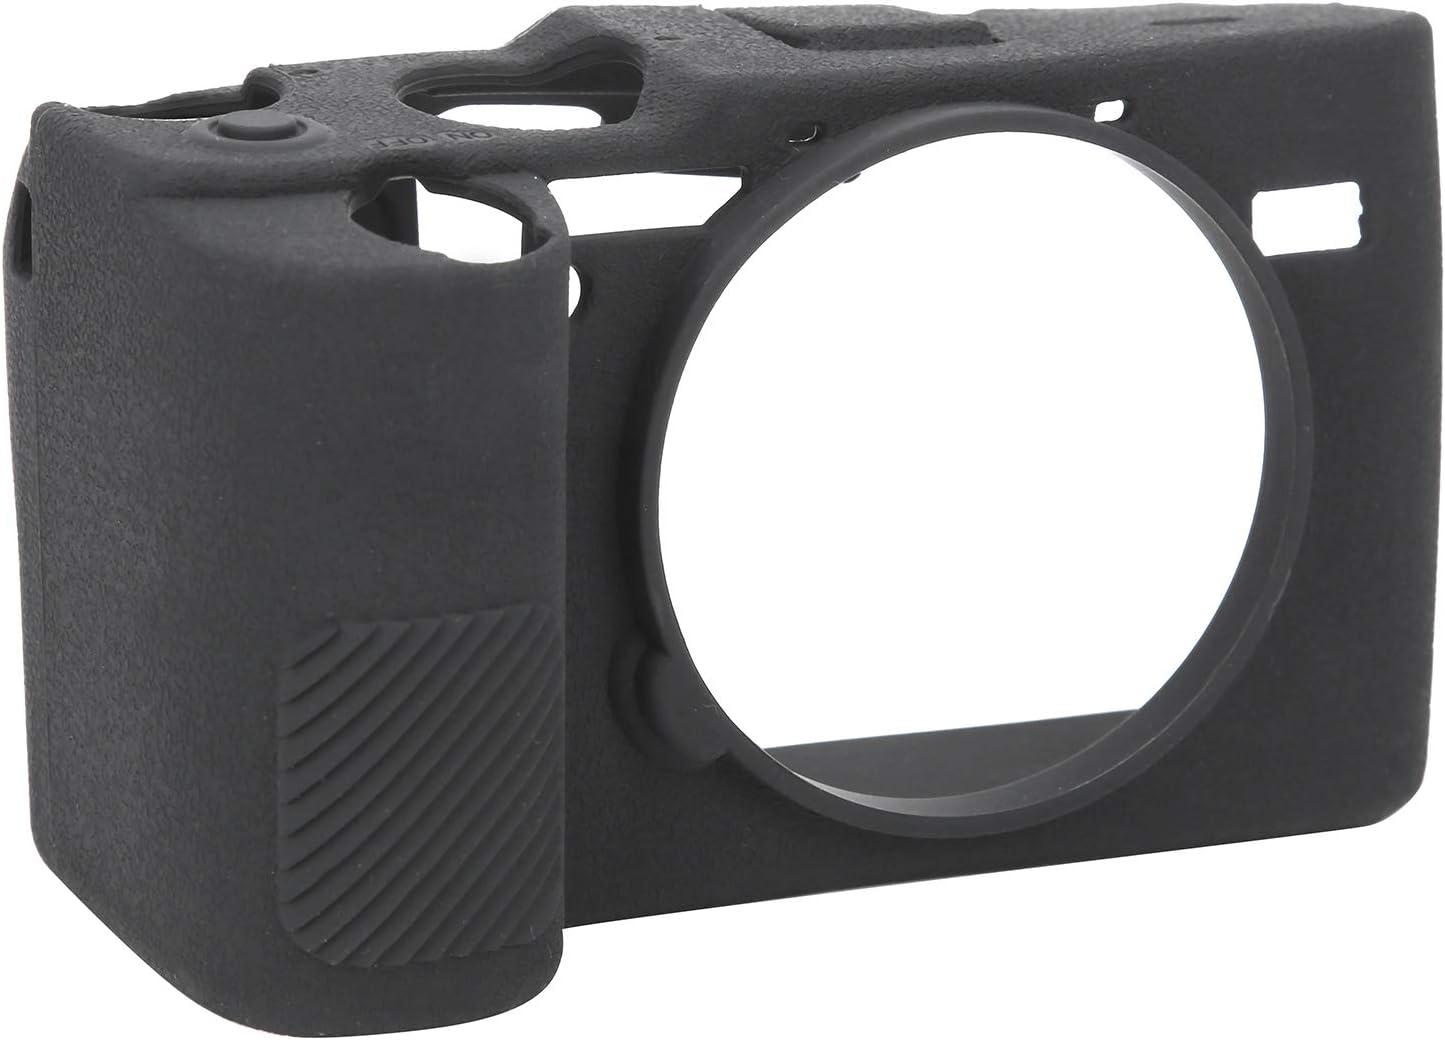 Archuu Silicone Camera Case for New color Body SonyA7C Full Protective Arlington Mall Co